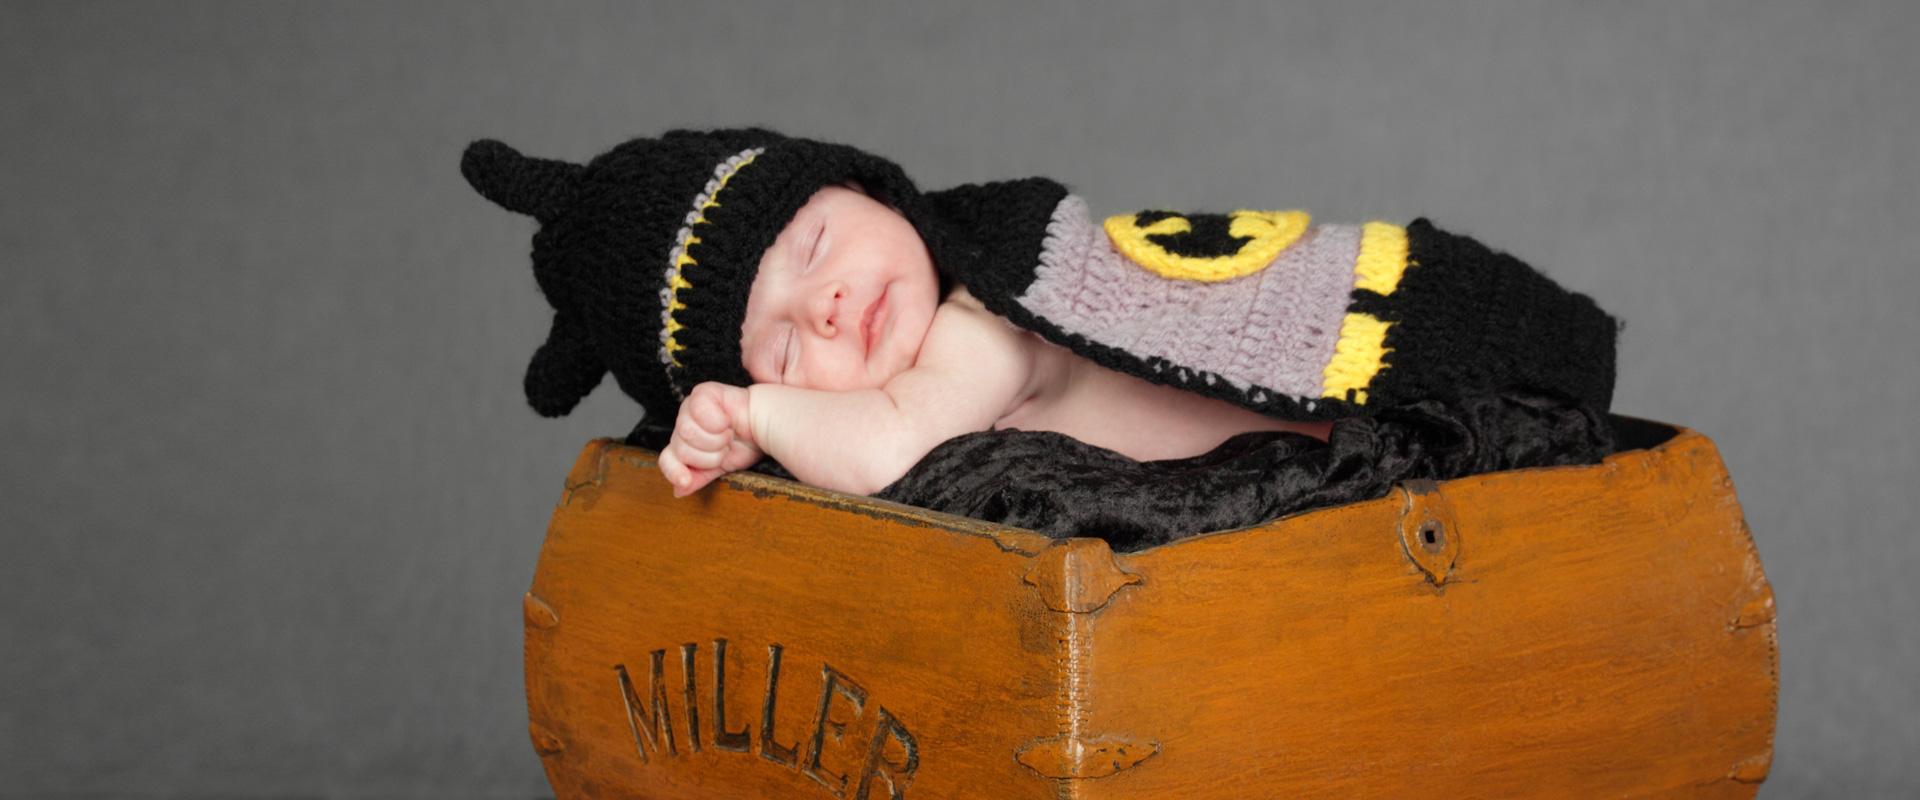 Babyportraits